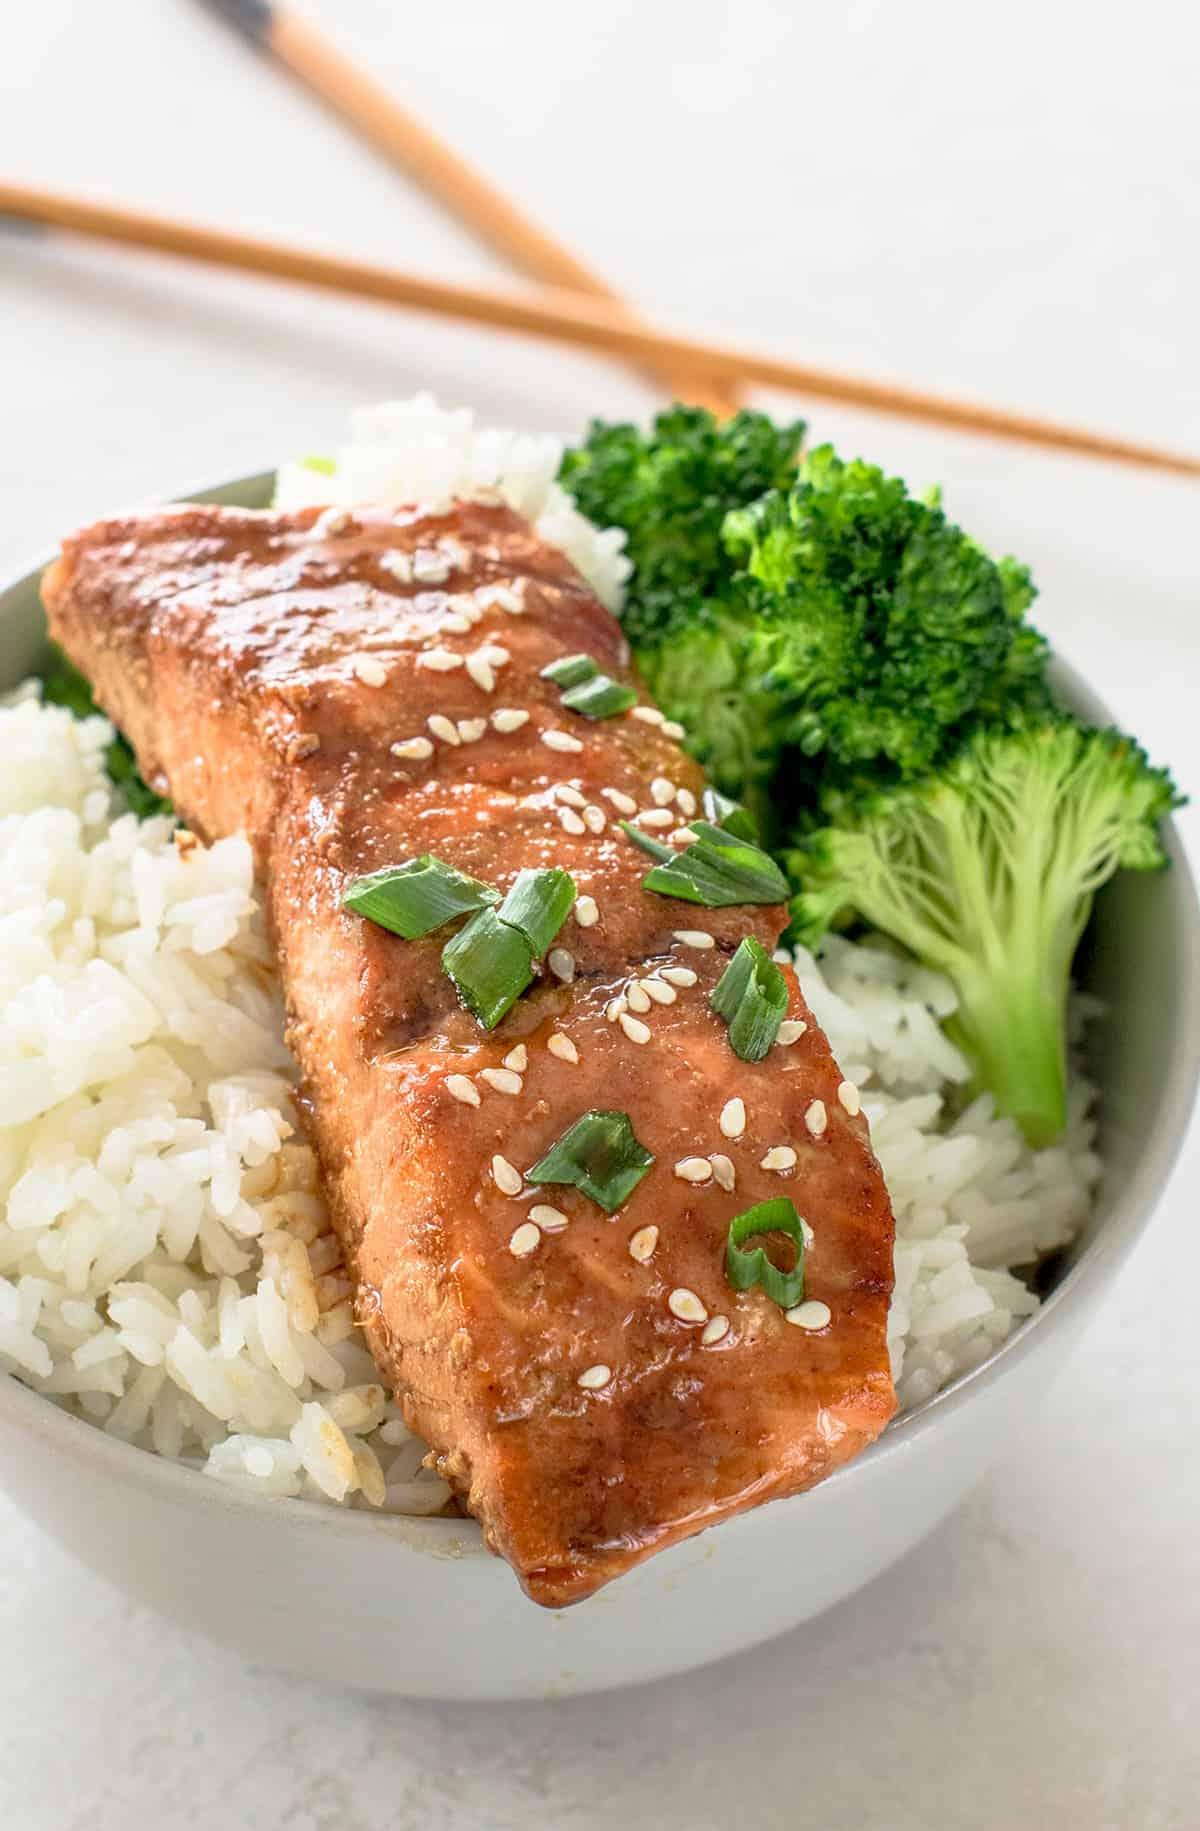 Baked Teriyaki Salmon over a rice bowl with broccoli florets on the side.